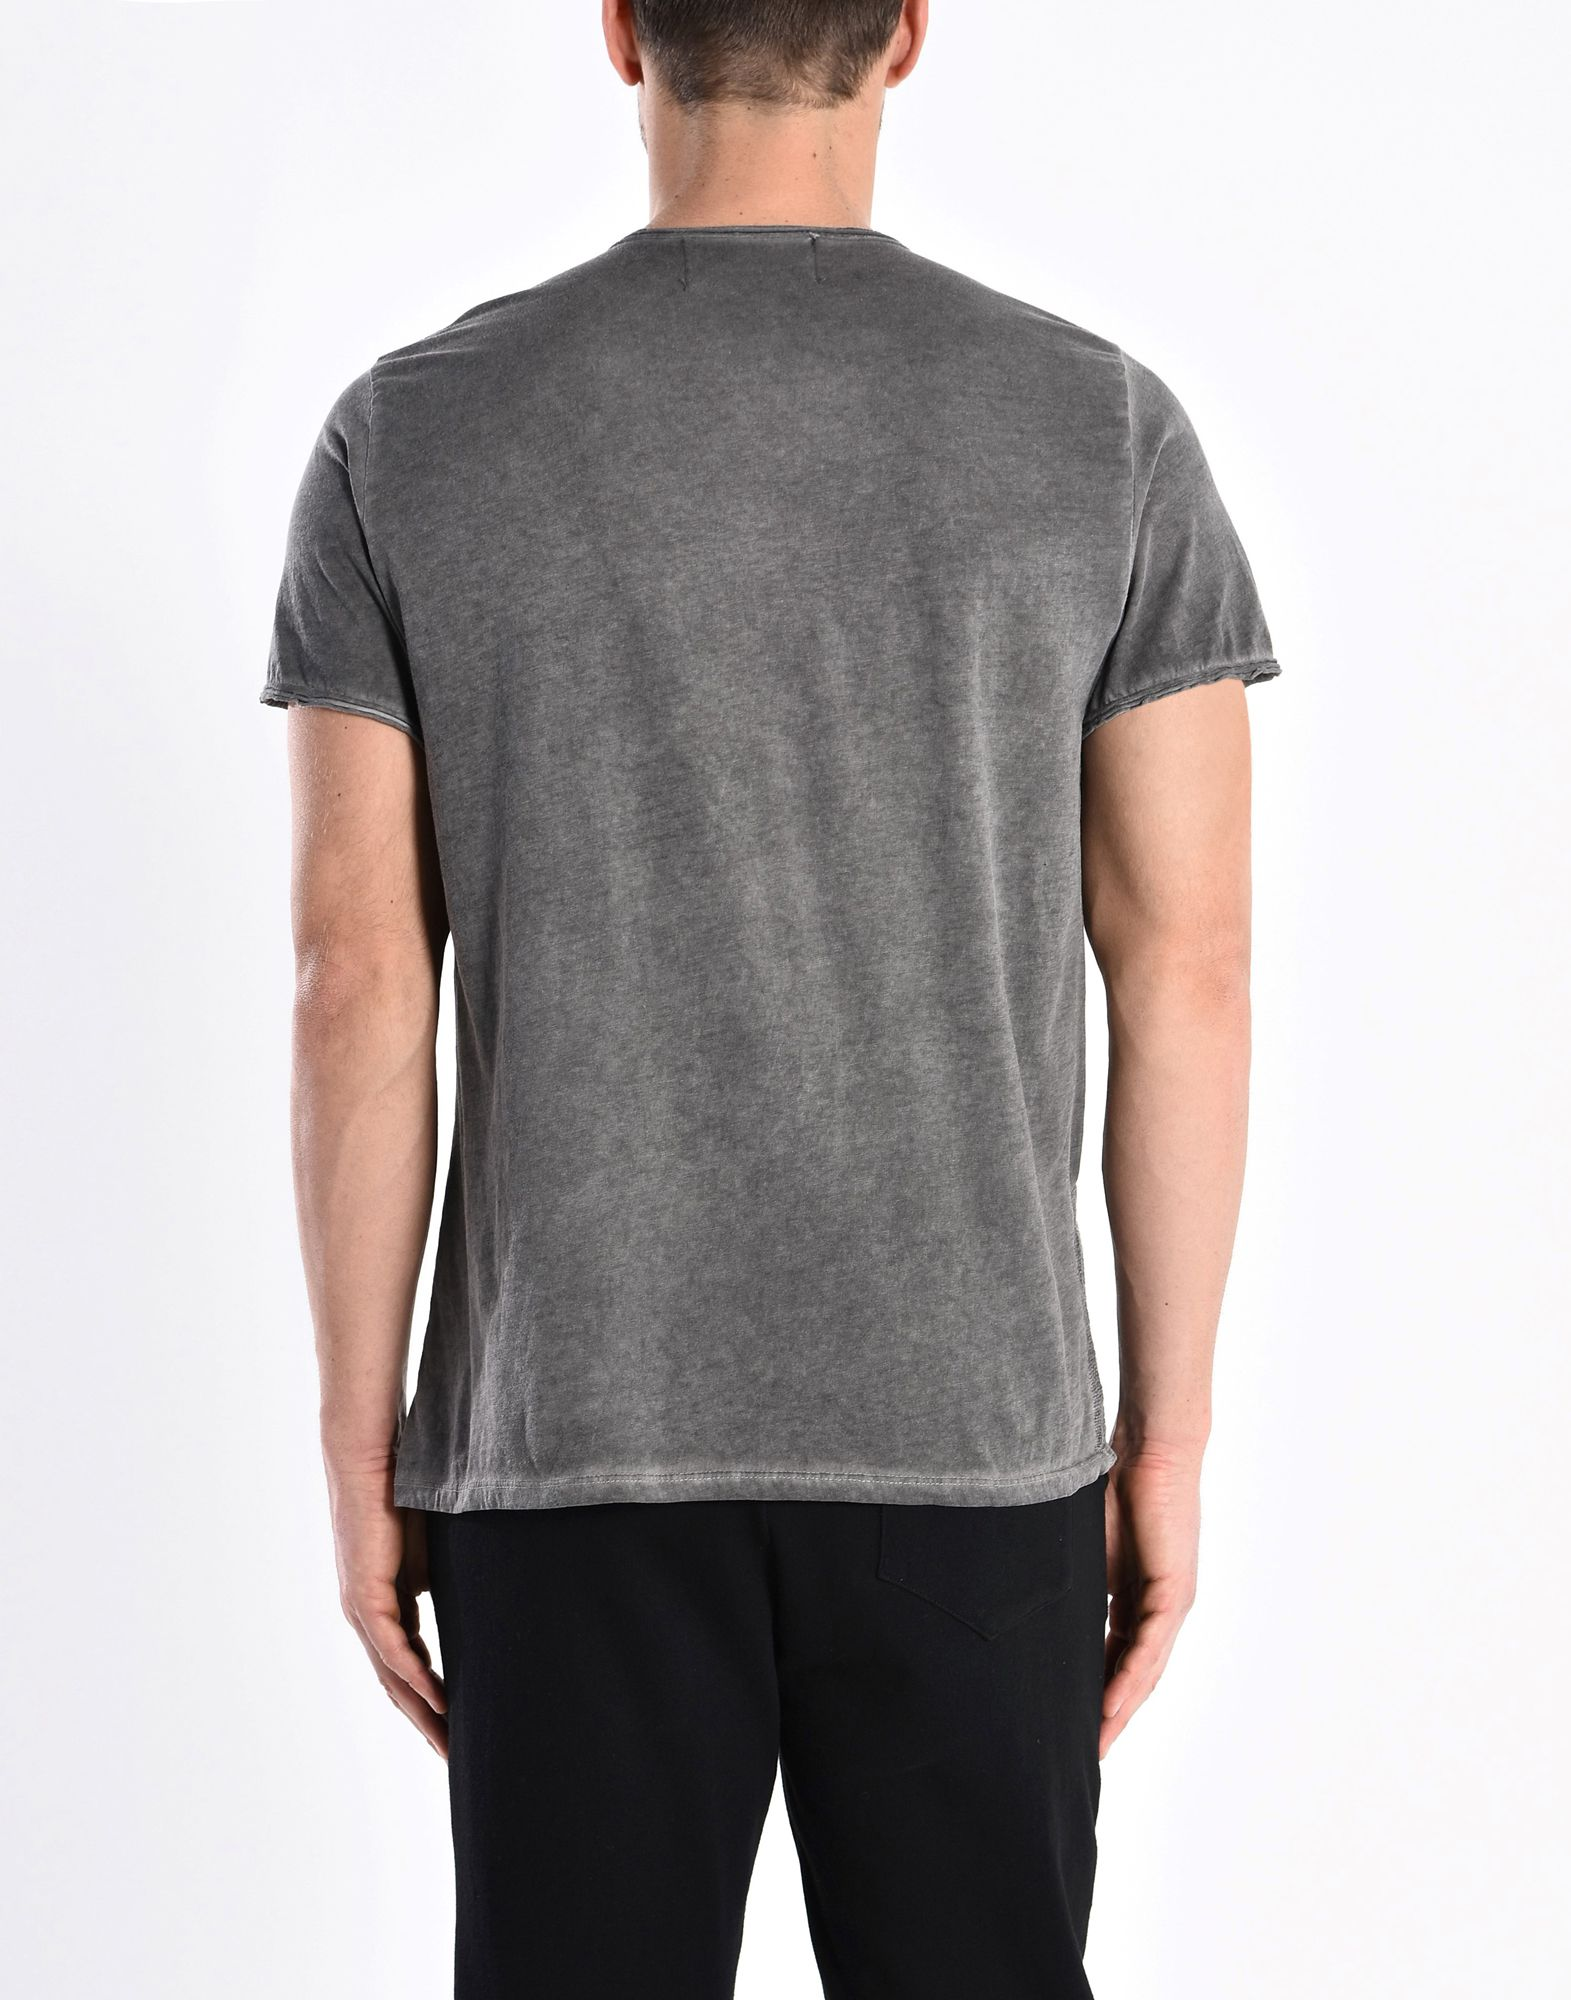 T-Shirt Pierre Darré Uomo Uomo Uomo - 12163608VJ 9fe1cf